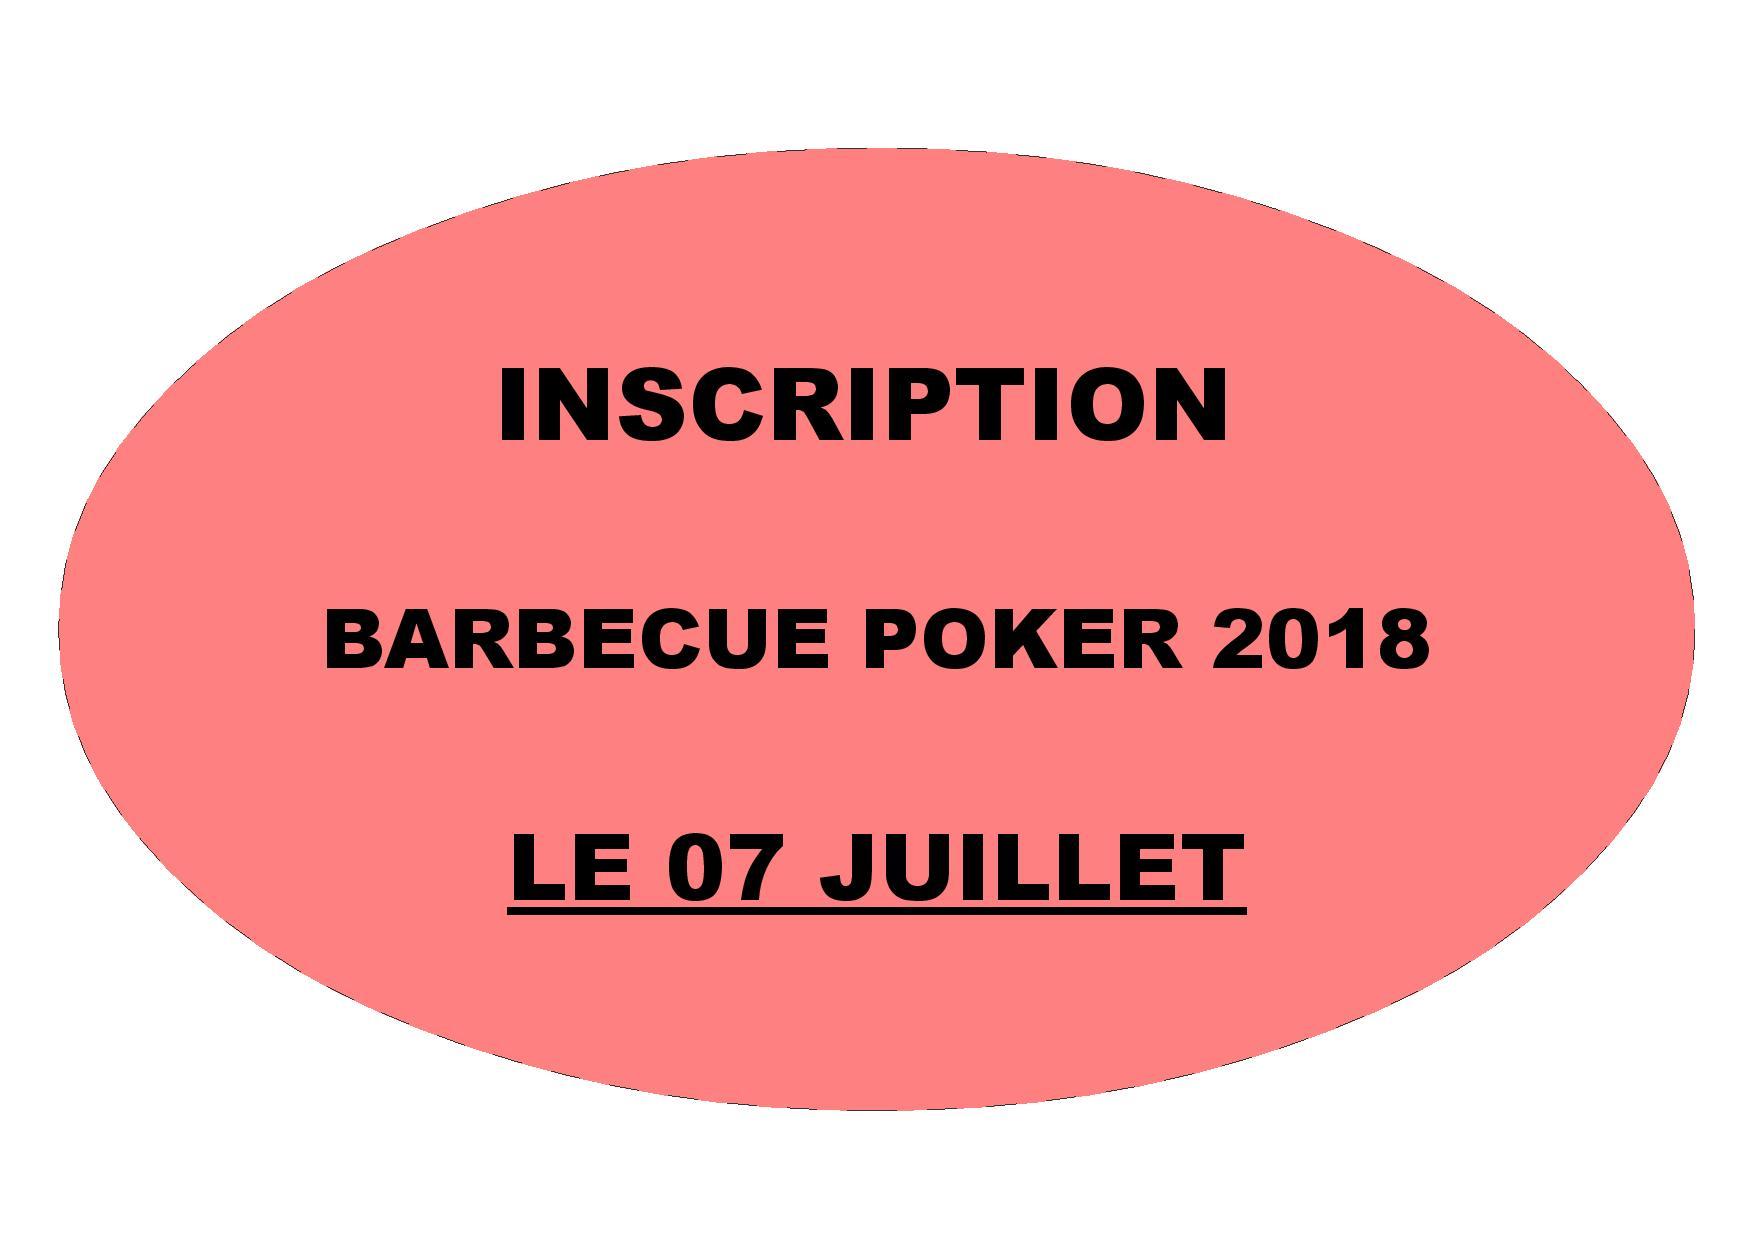 Inscription barbecue poker 07 juillet 2018